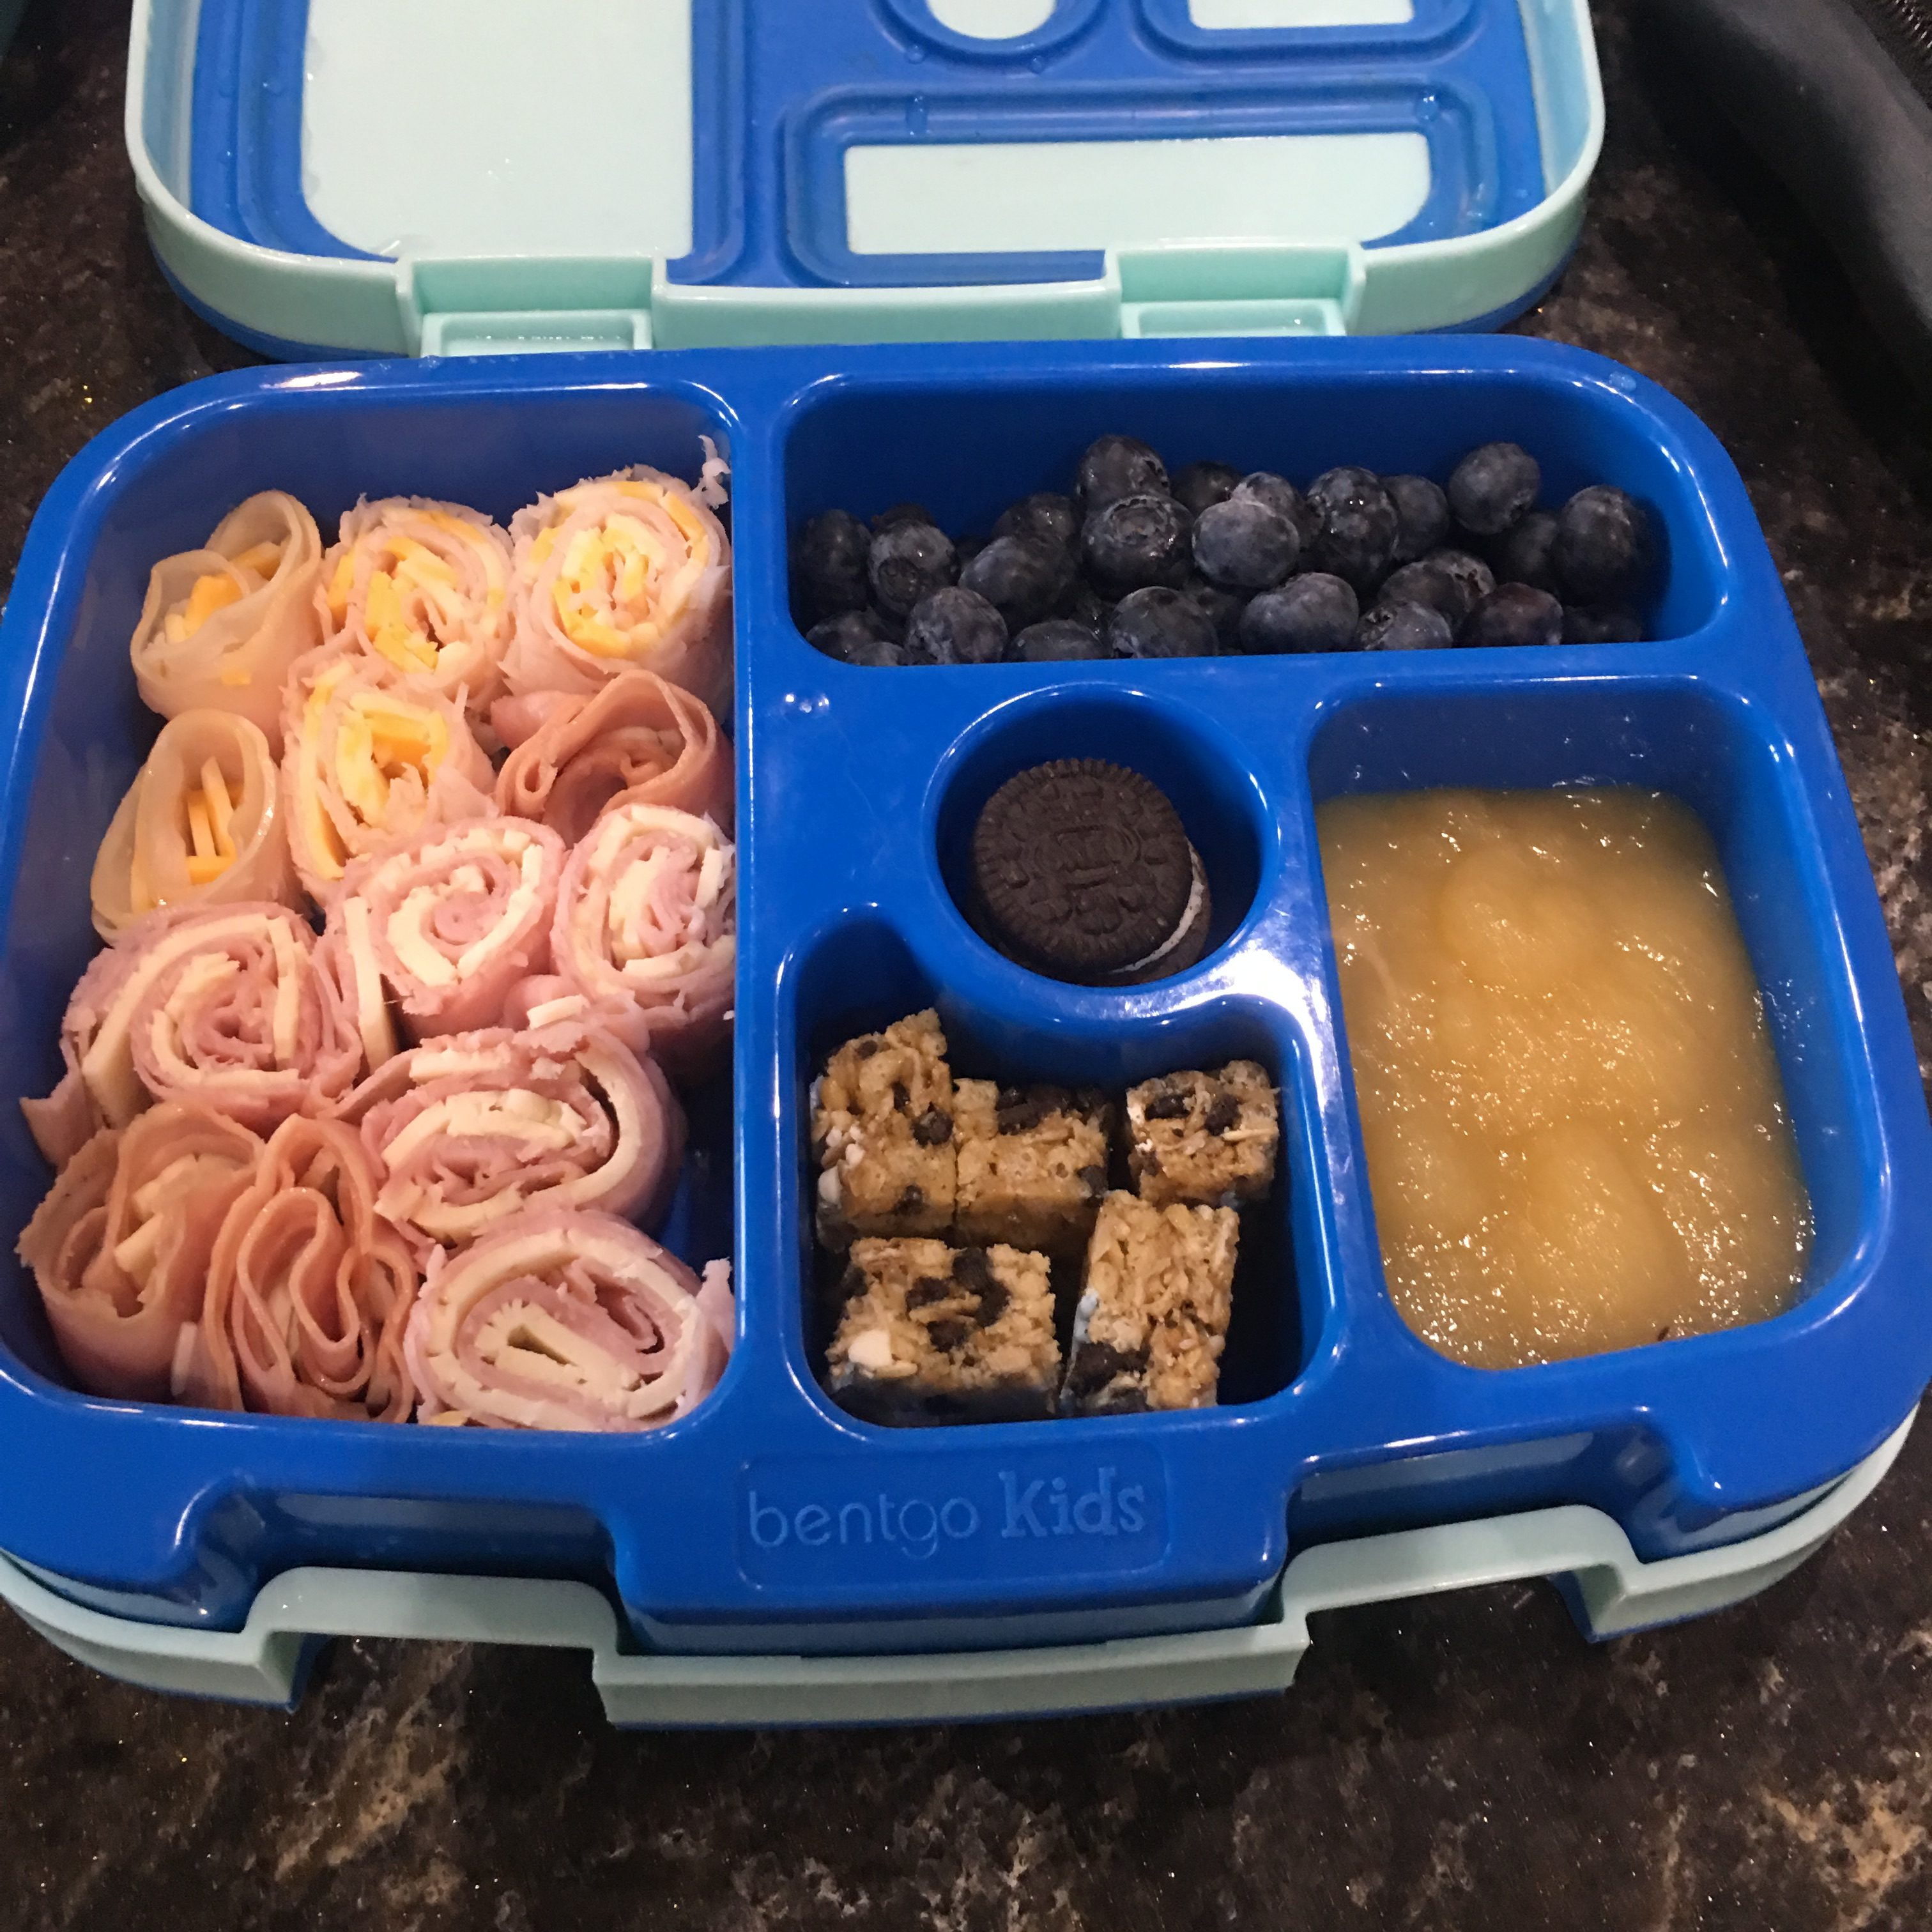 Bentgo Lunch Box 2